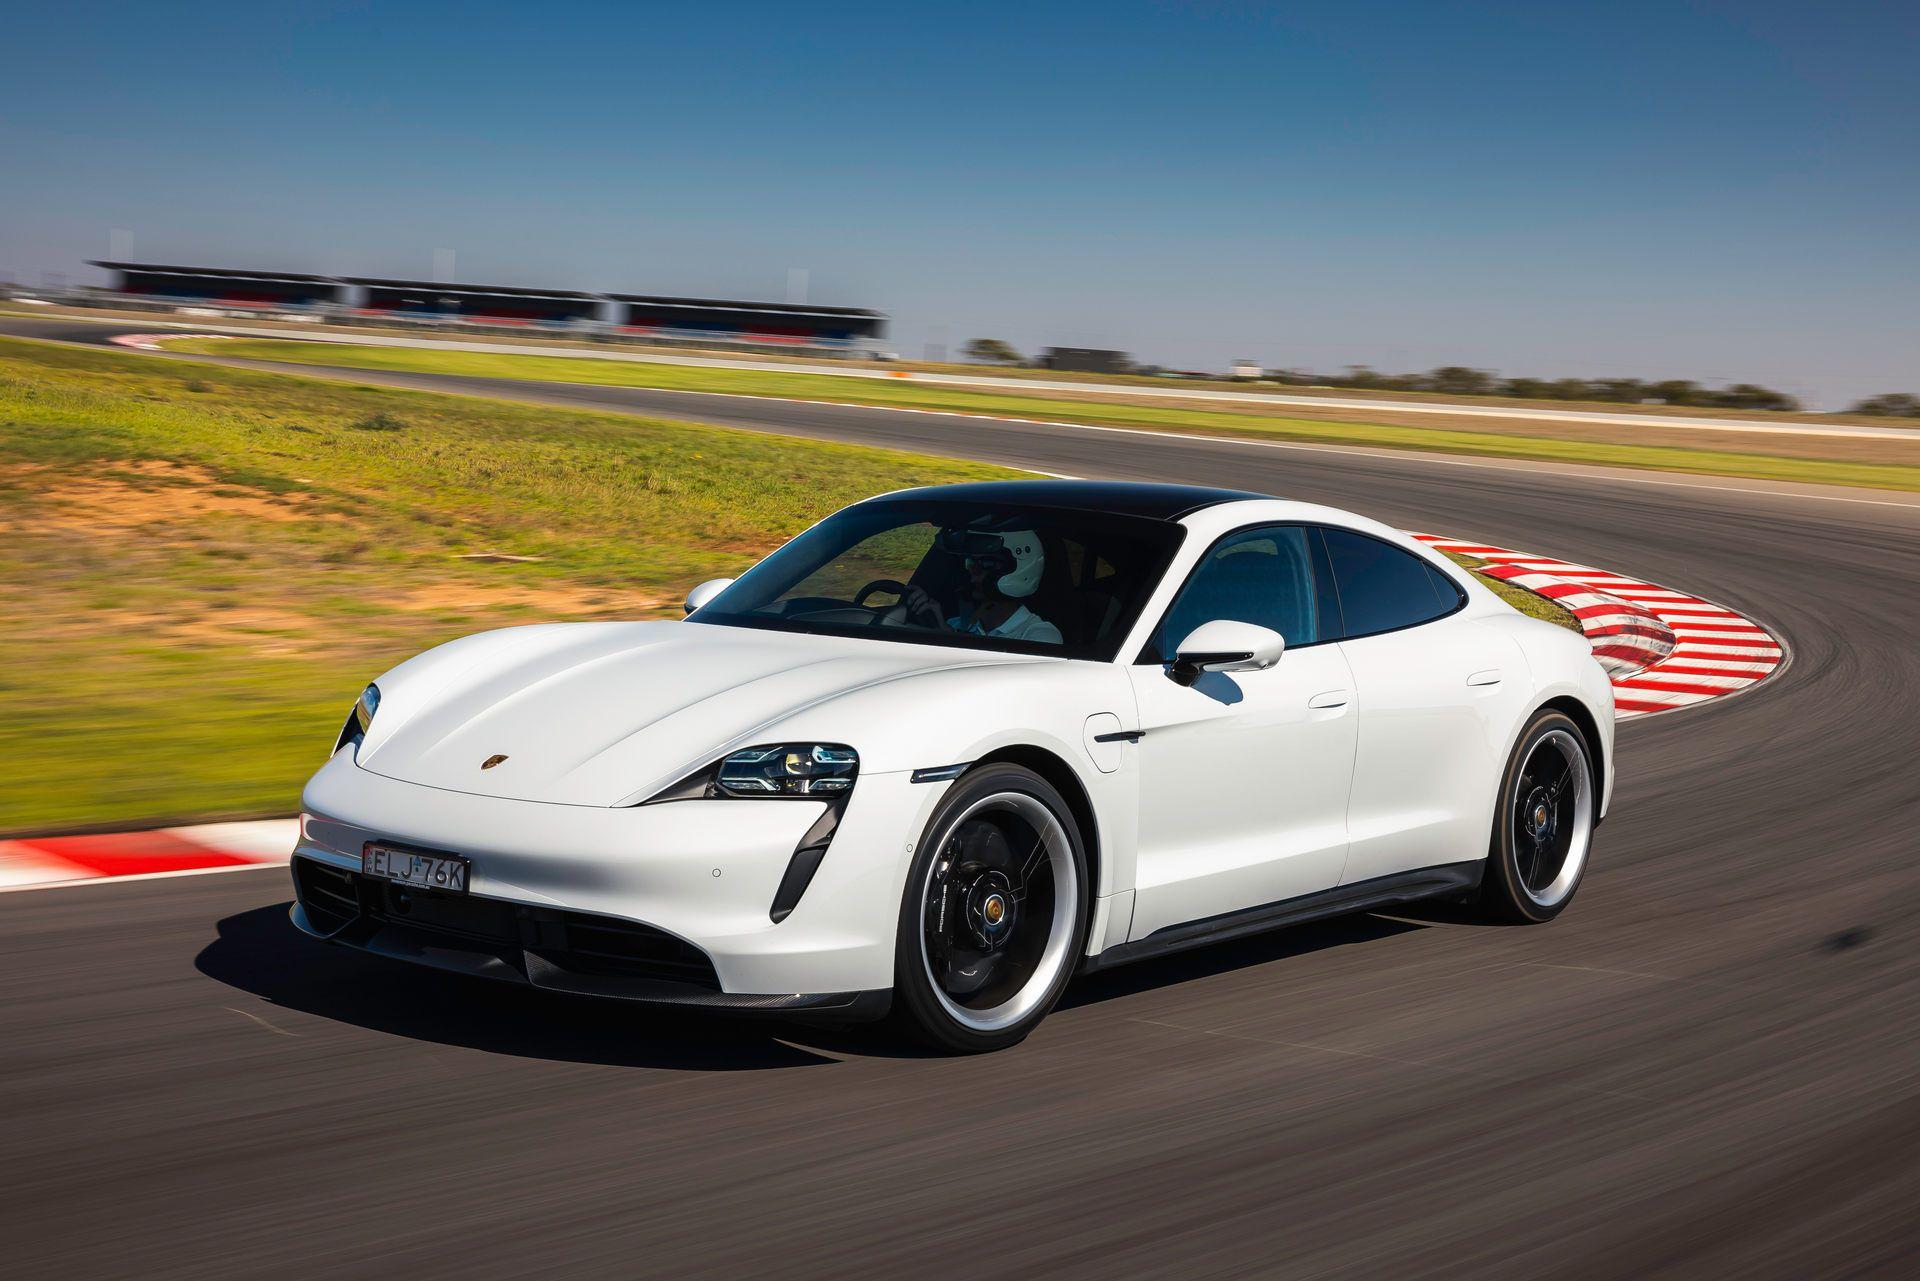 Porsche-Taycan-Turbo-S-The-Bend-Motorsport-Park-45